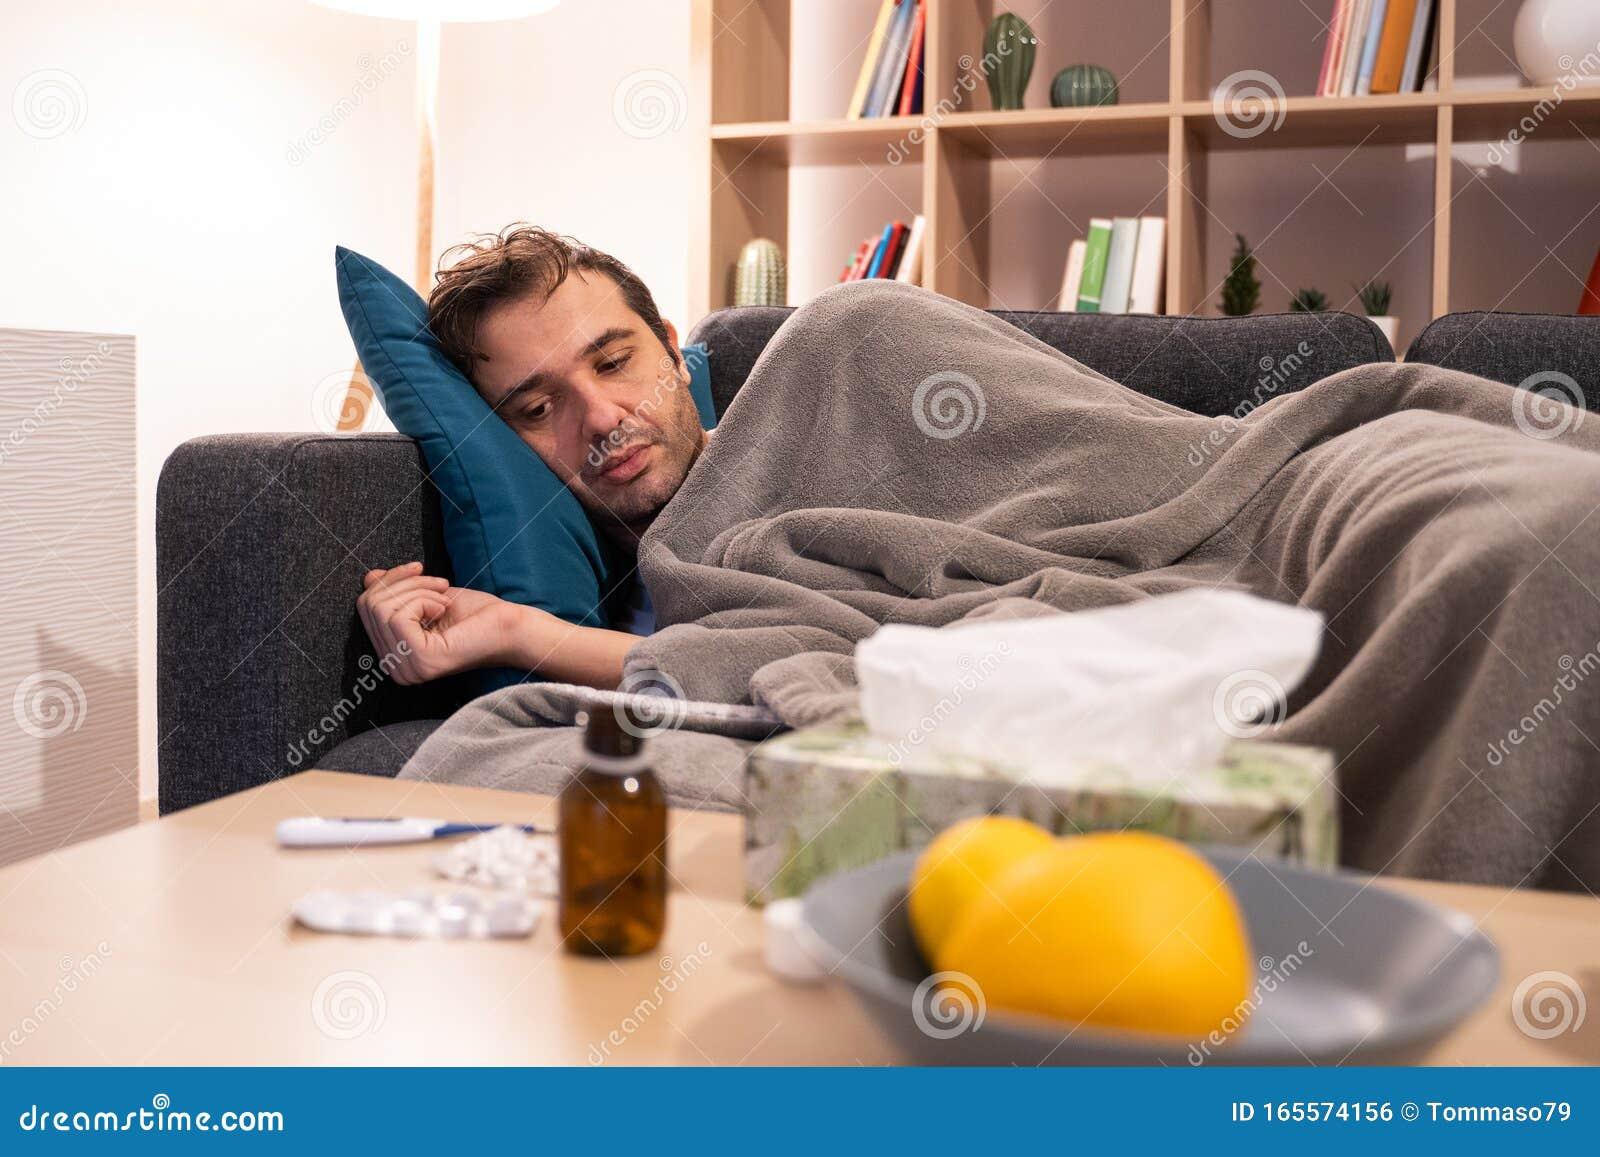 portrait-man-home-sick-days-suffering-cold-flu-165574156.jpg?profile=RESIZE_400x